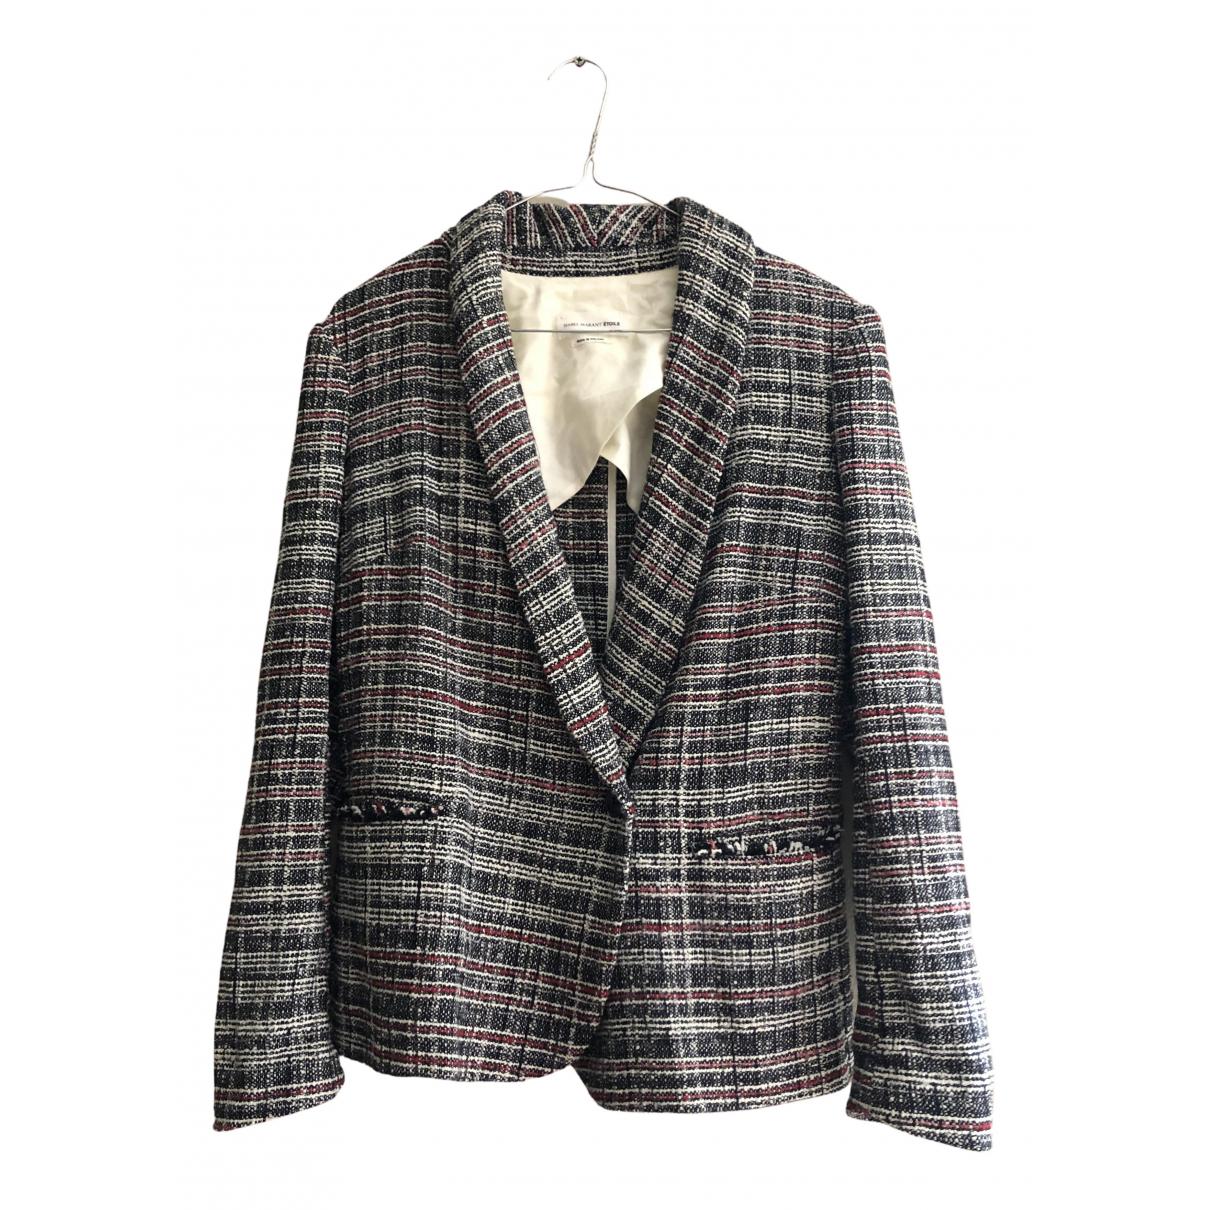 Isabel Marant Etoile \N Anthracite Tweed jacket for Women 38 FR